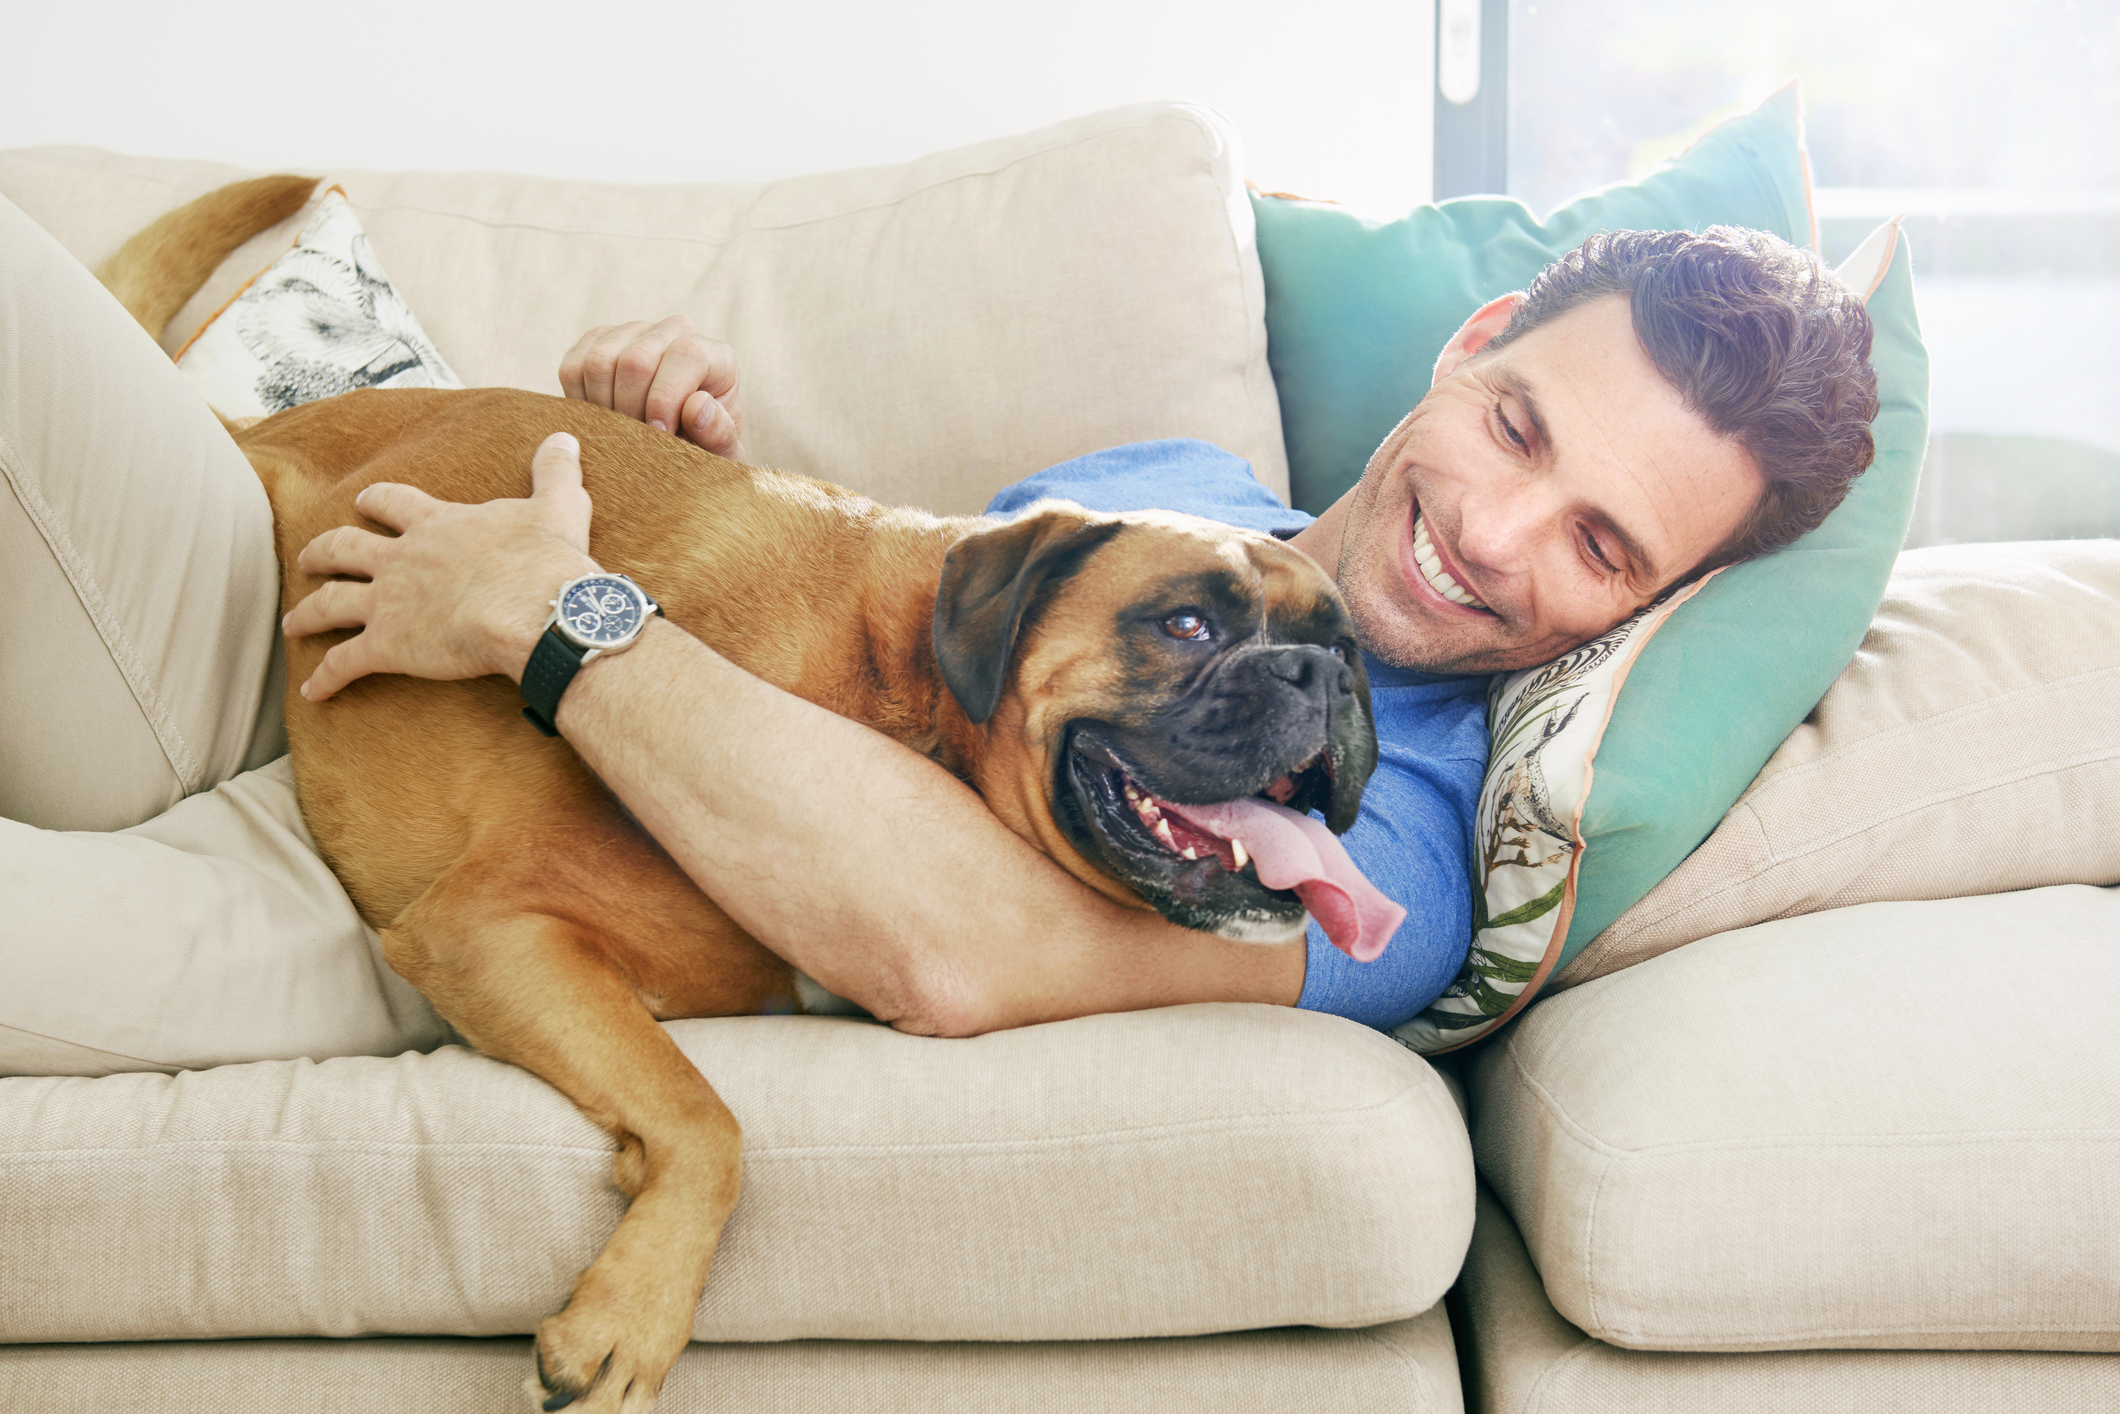 Man lying down cuddling bid dog on the sofa